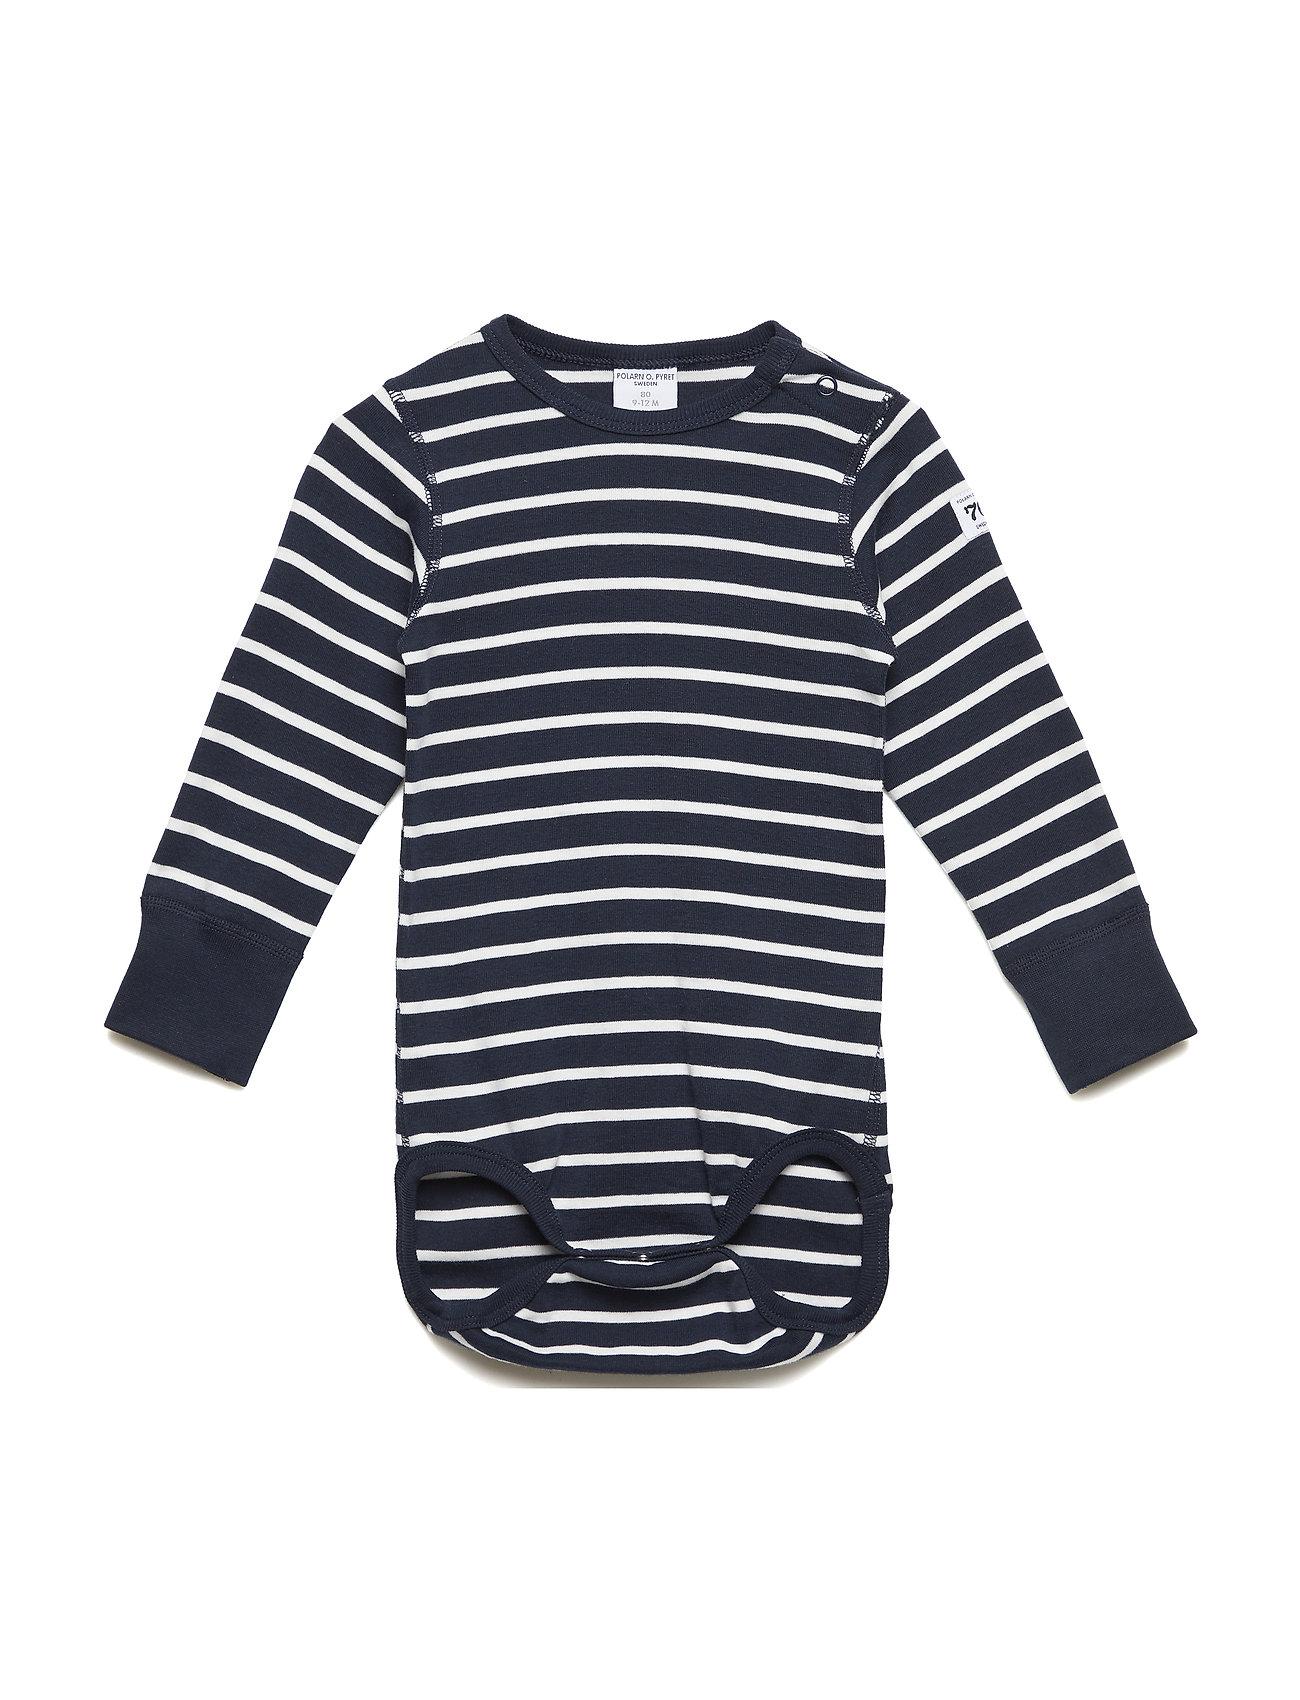 Polarn O. Pyret Body PO.P Stripe l/s Baby - DARK SAPPHIRE